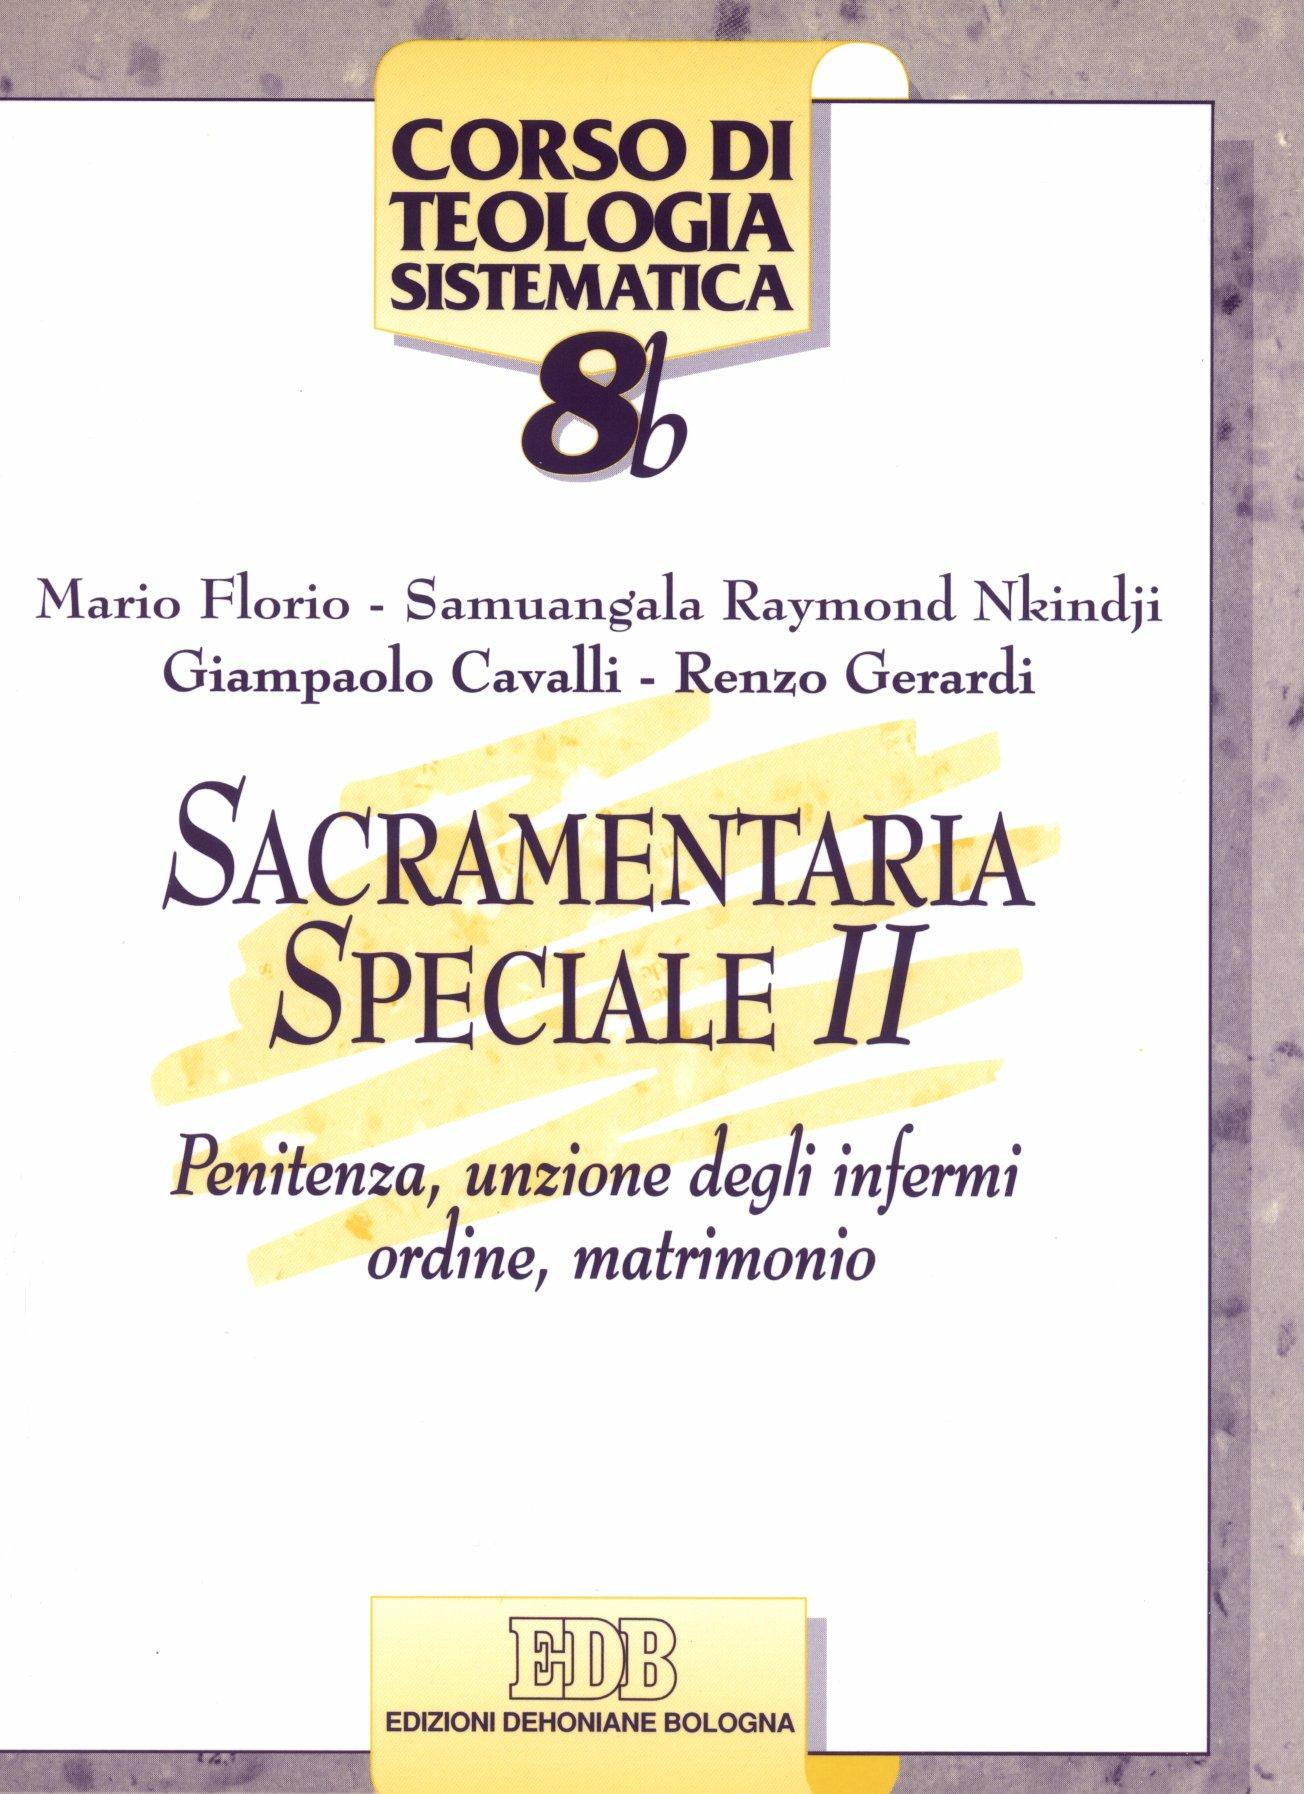 Sacramentaria speciale vol. II